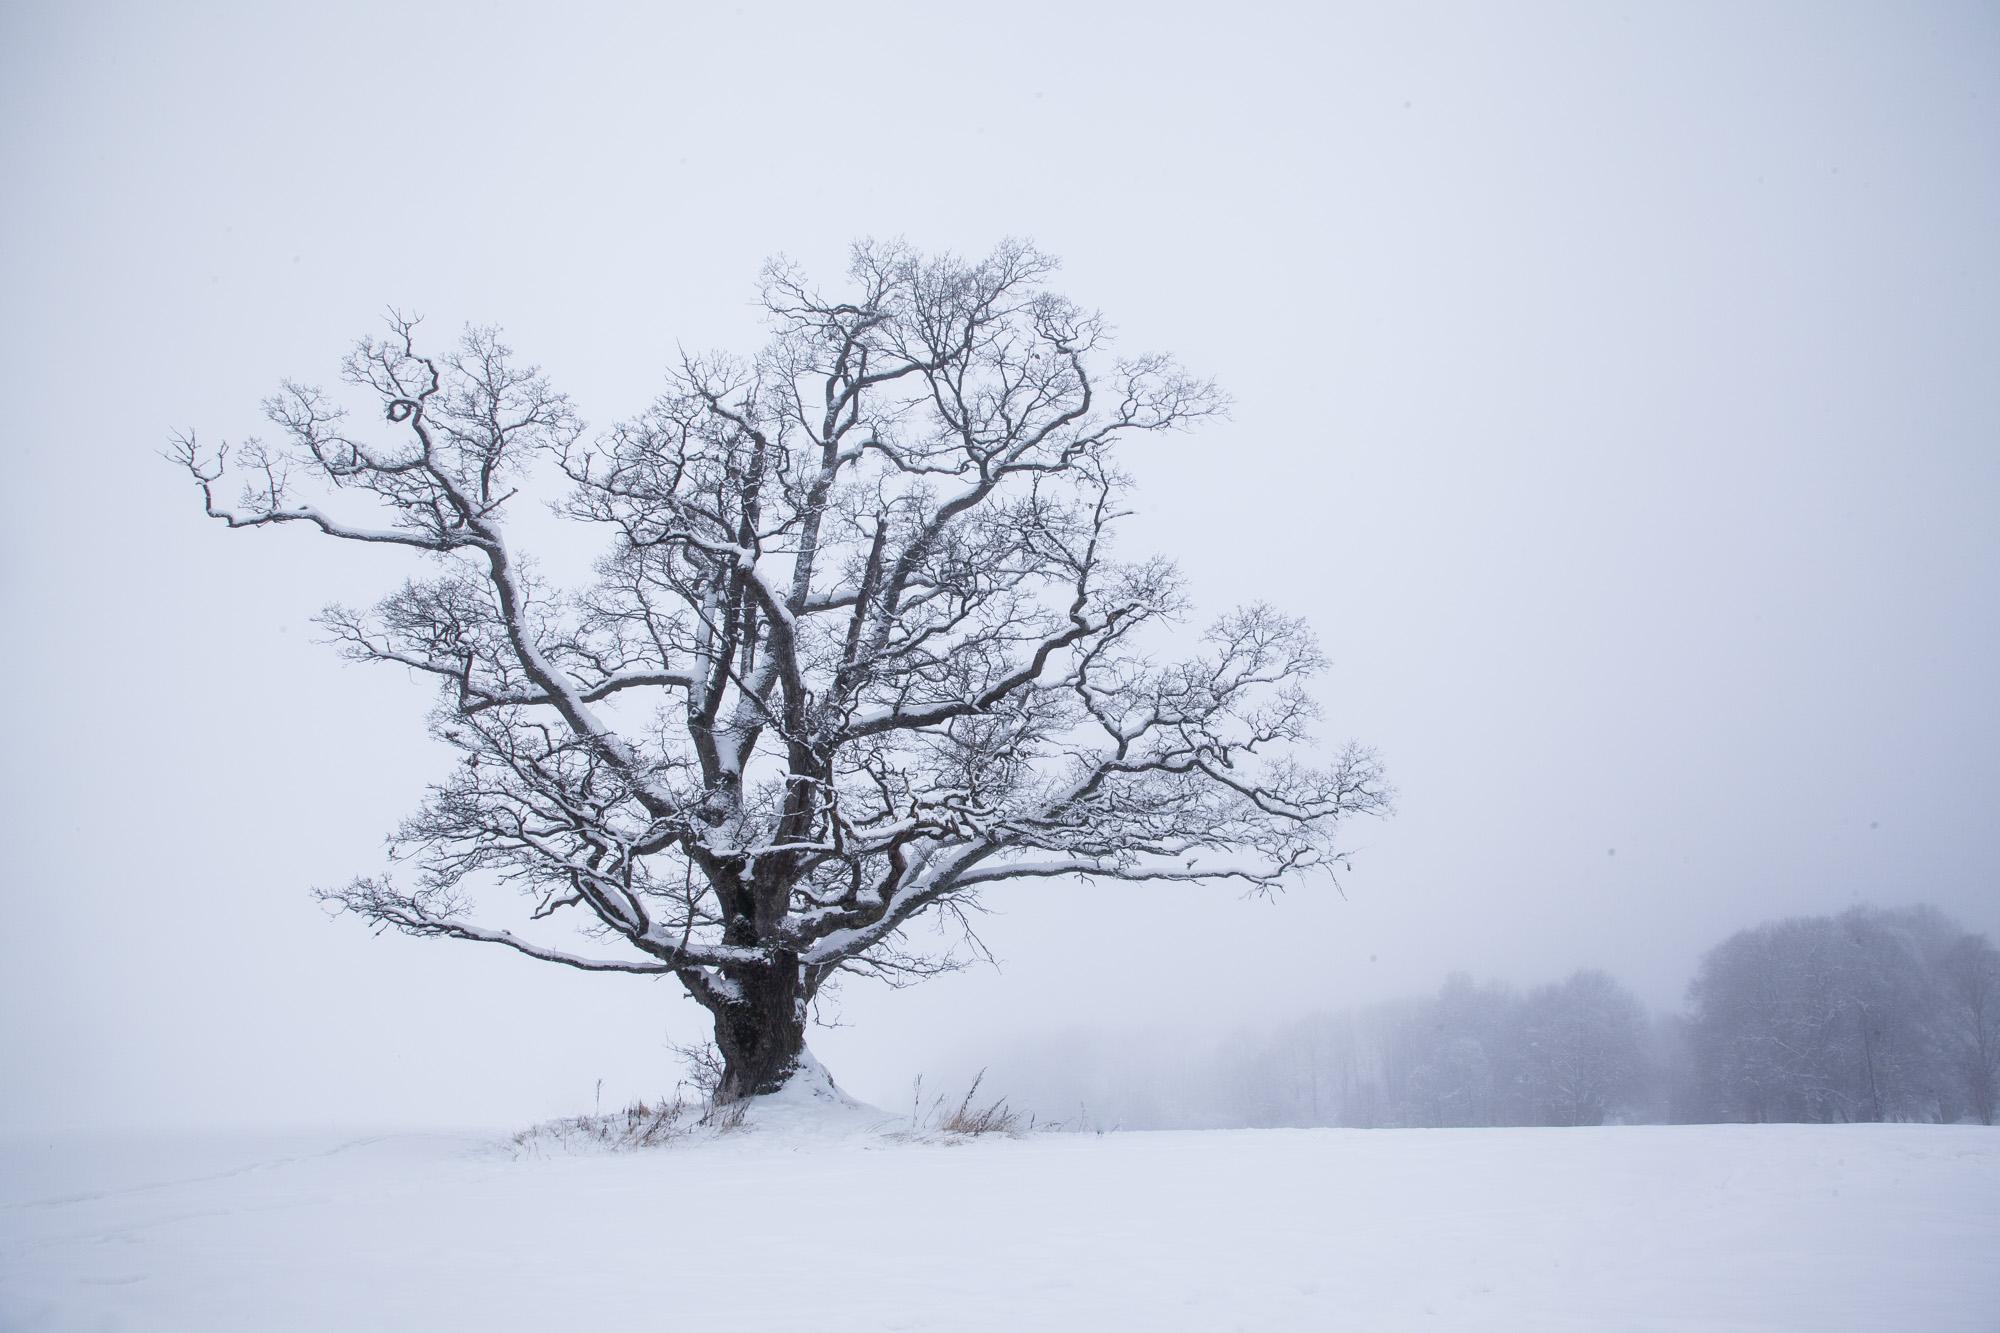 033 - Ås-eika i vinterkulde